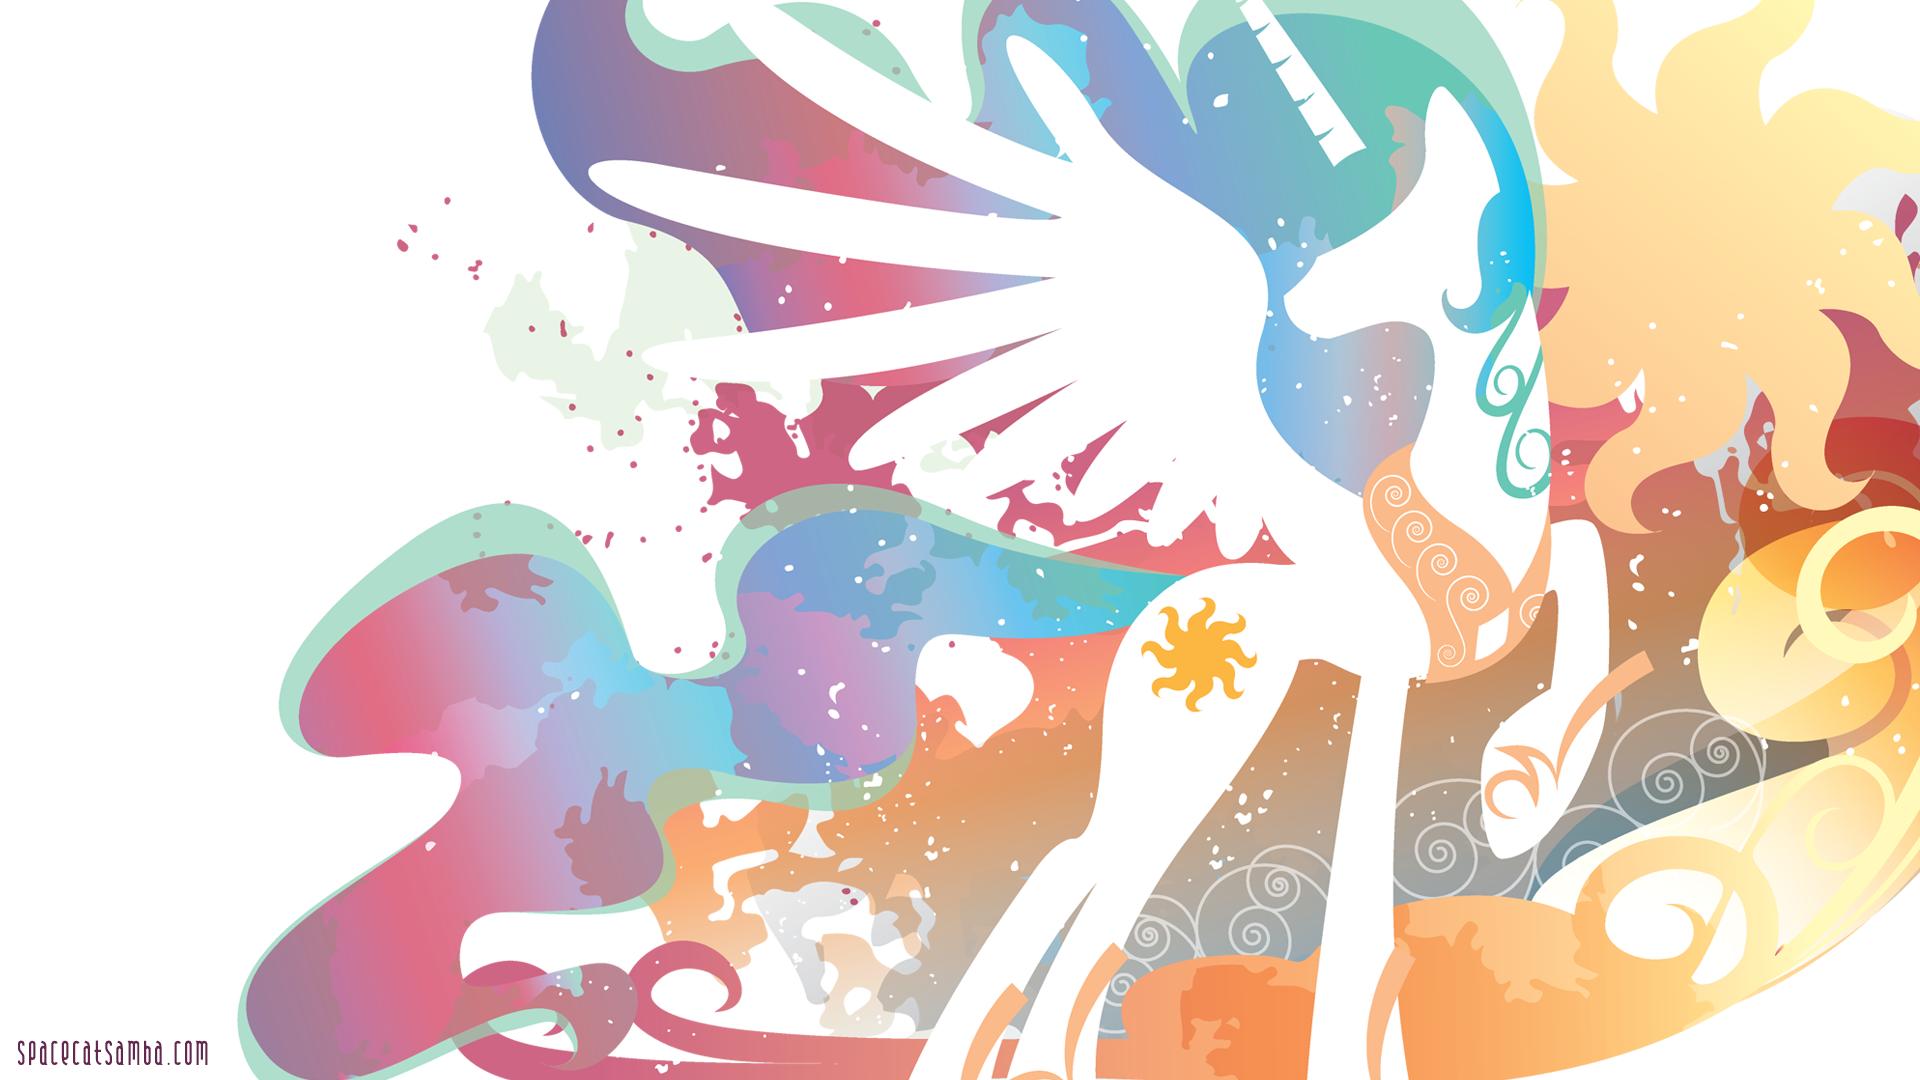 Wallpaper Ilustrasi Gambar Kartun My Little Pony Putri Celestia 1920x1080 Px Fon Kuda Seperti Mamalia 1920x1080 Wallhaven 545129 Hd Wallpapers Wallhere